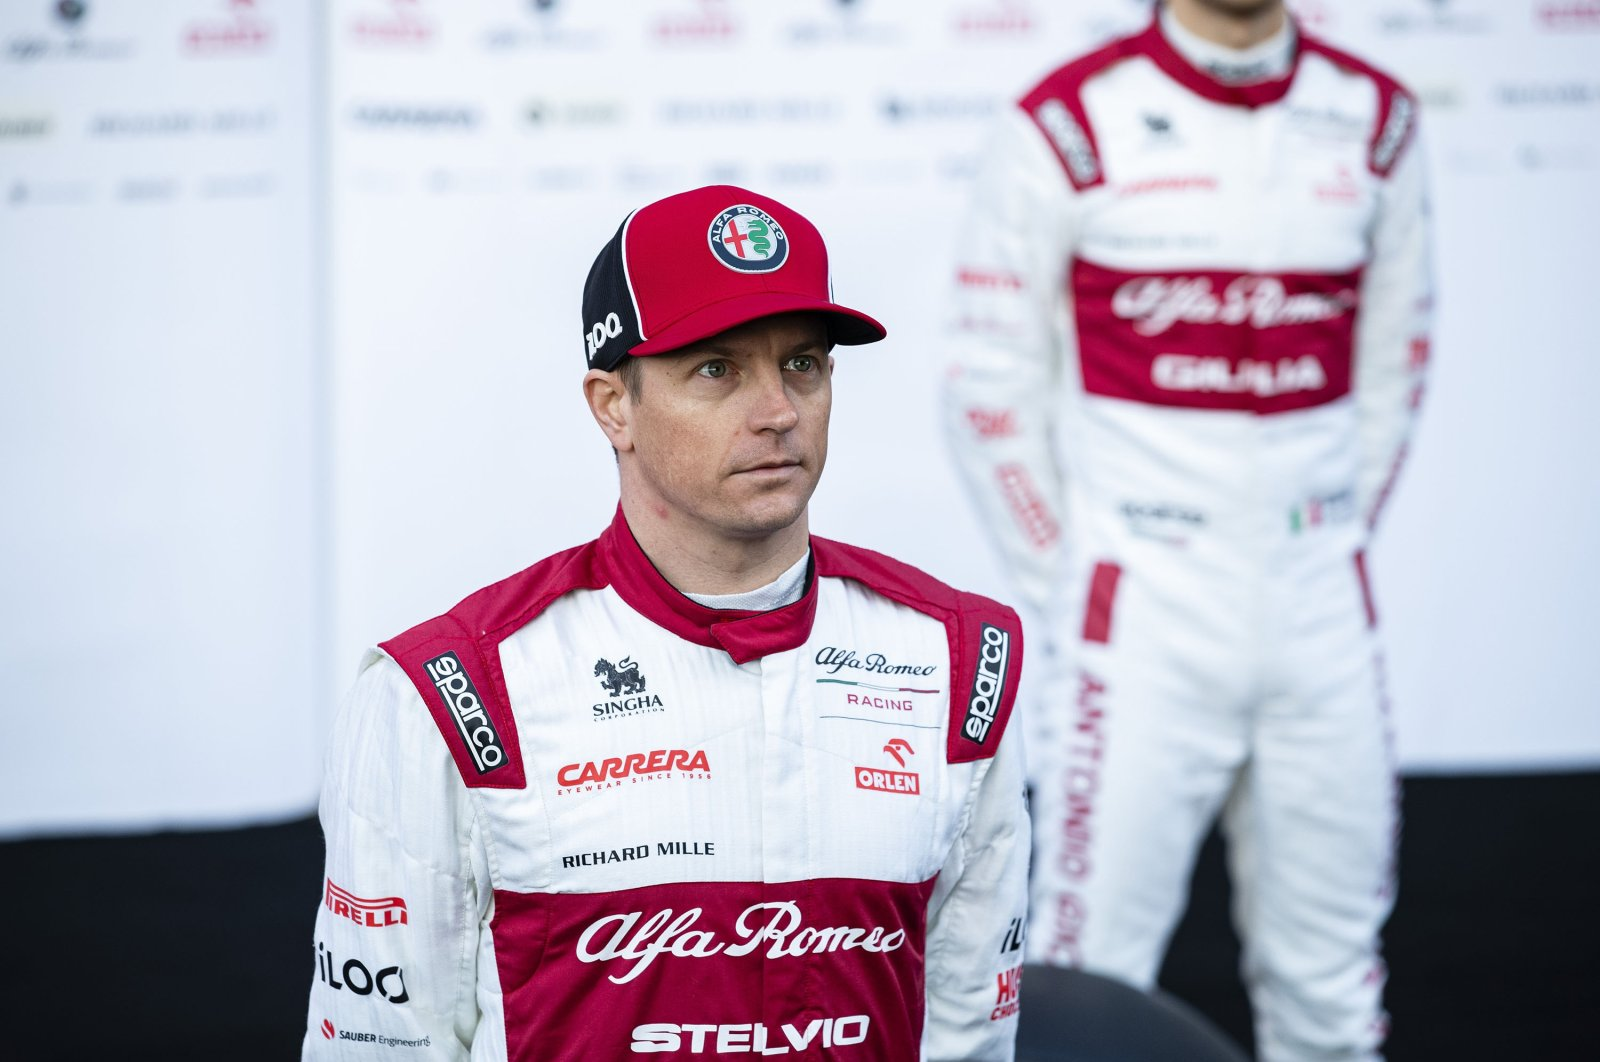 Alfa Romeo's Finnish driver Kimi Raikkonen poses for a photo in Barcelona, Spain, Feb. 19, 2020. (Getty Images)